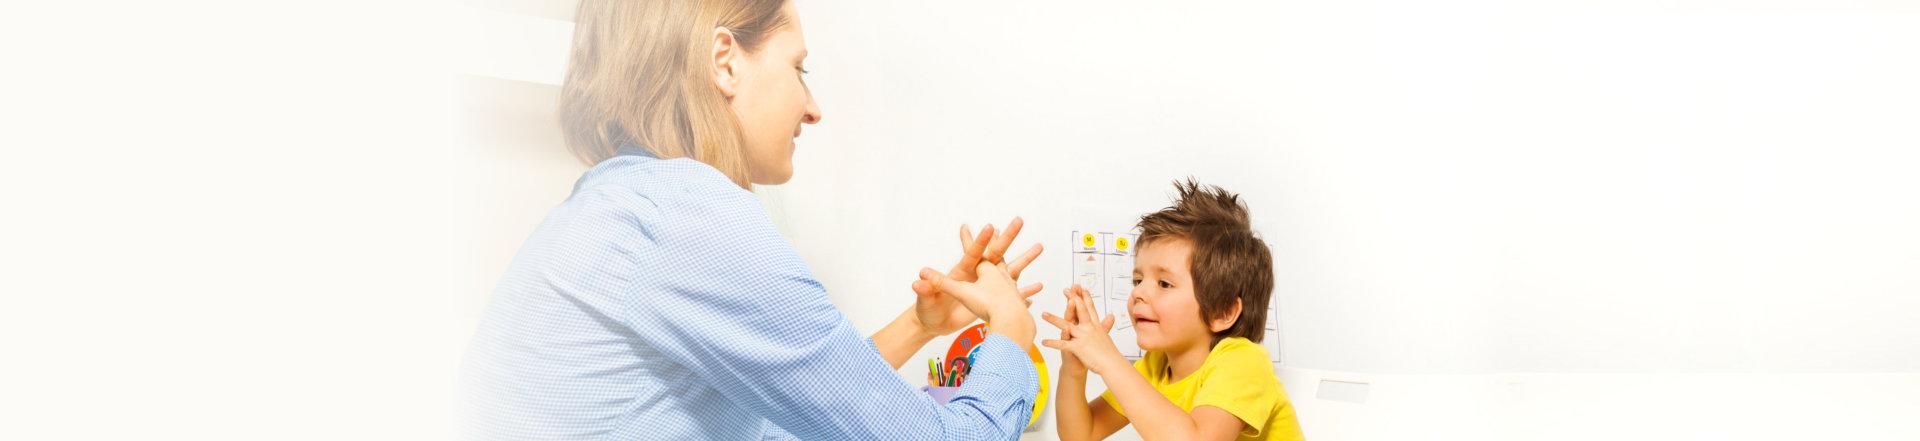 woman teaching the child